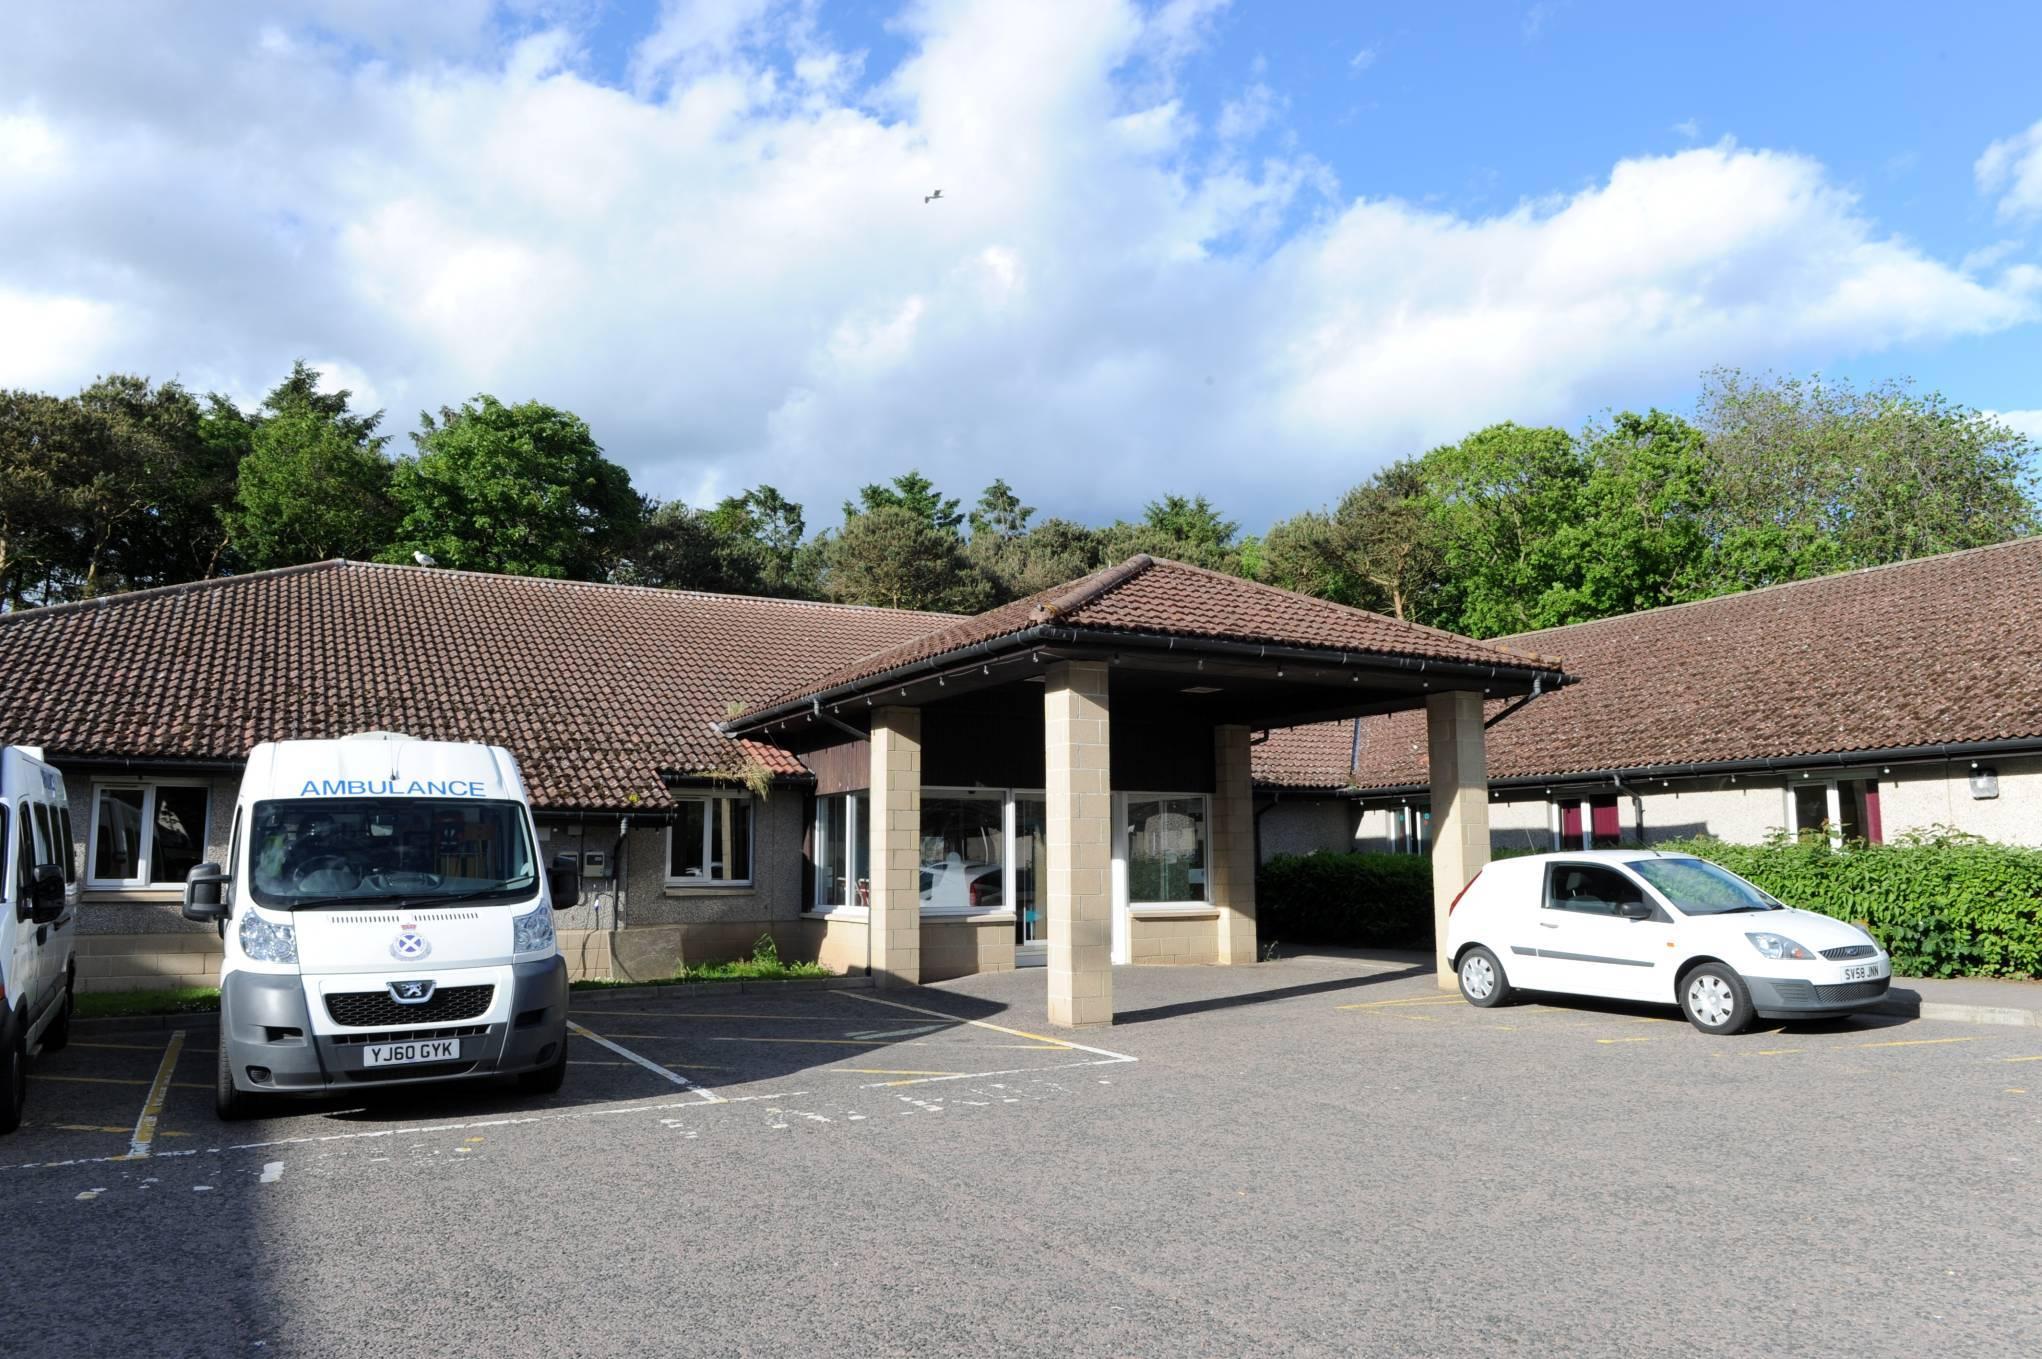 Kincardine Community Hospital in Stonehaven.